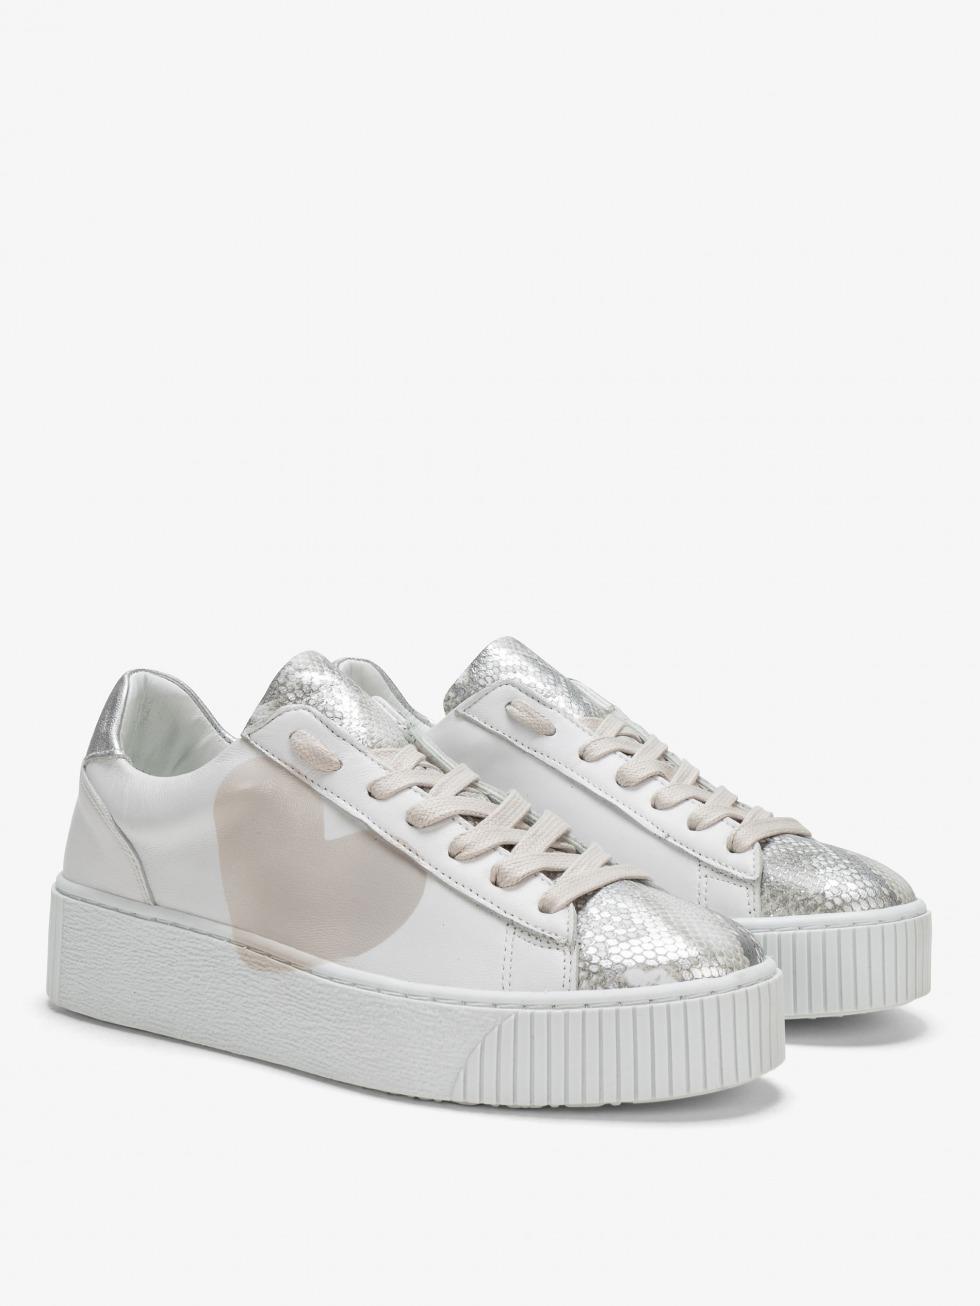 Cosmopolitan Sneakers - White Python Heart